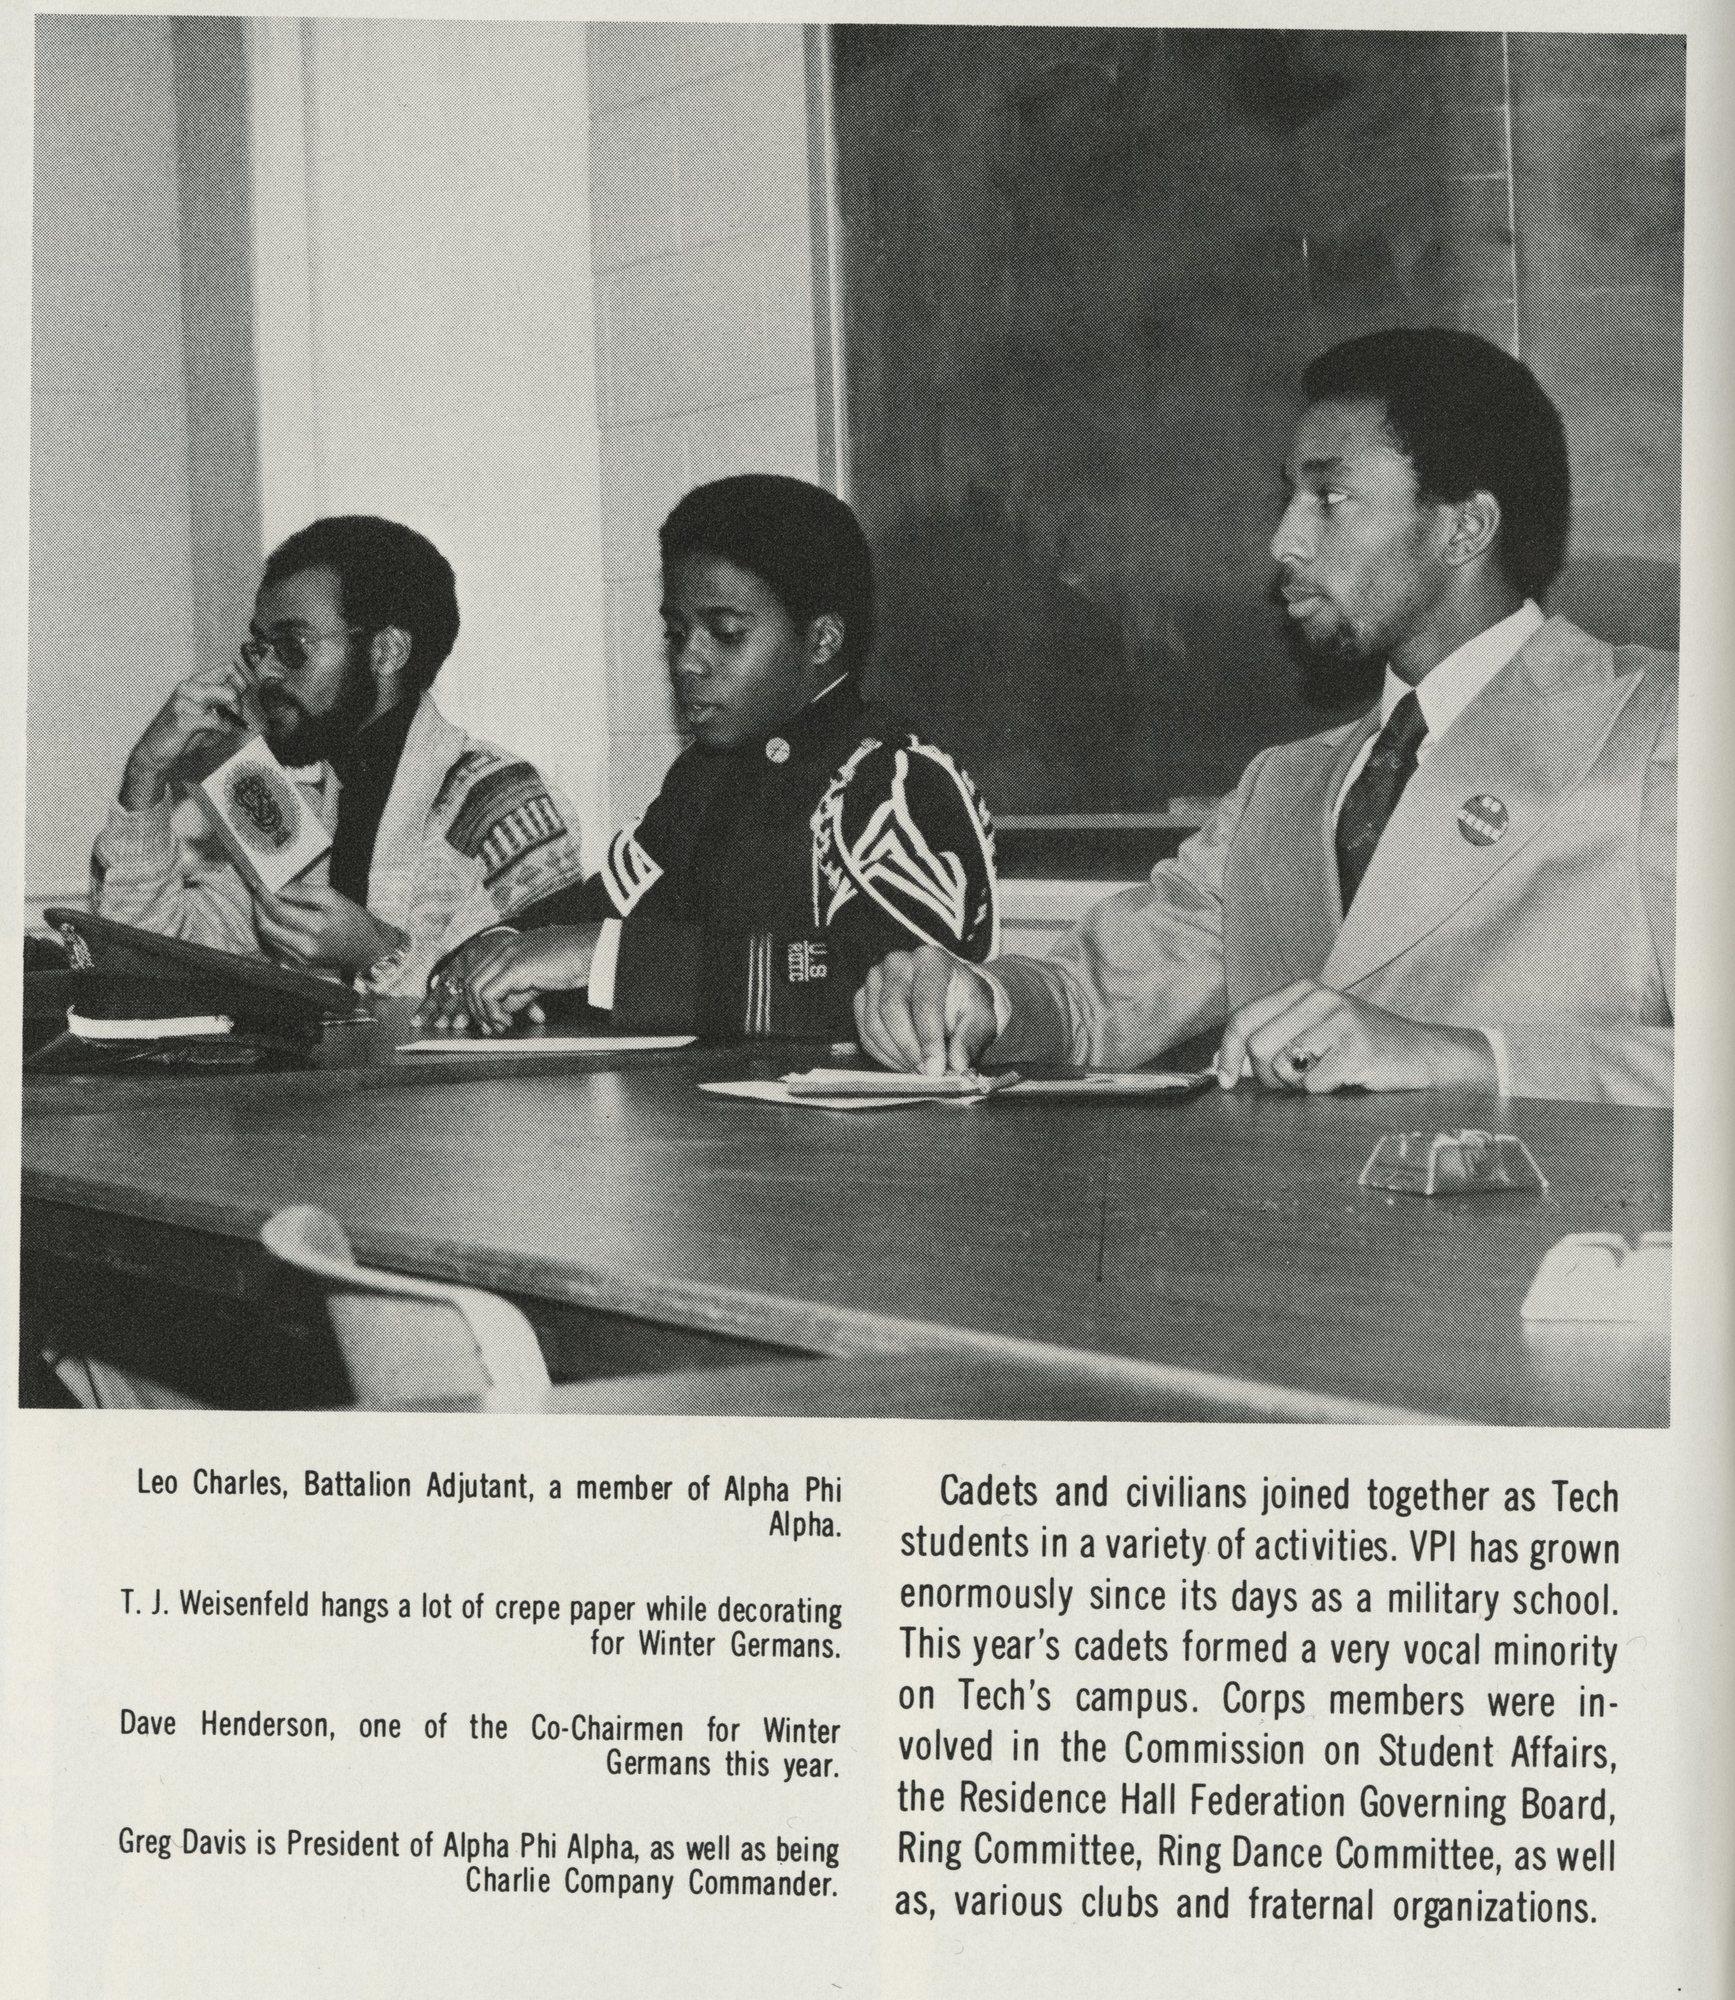 http://spec.lib.vt.edu/pickup/Omeka_upload/1978_Bugle_pg322_AlphaPhiAlpha.jpg